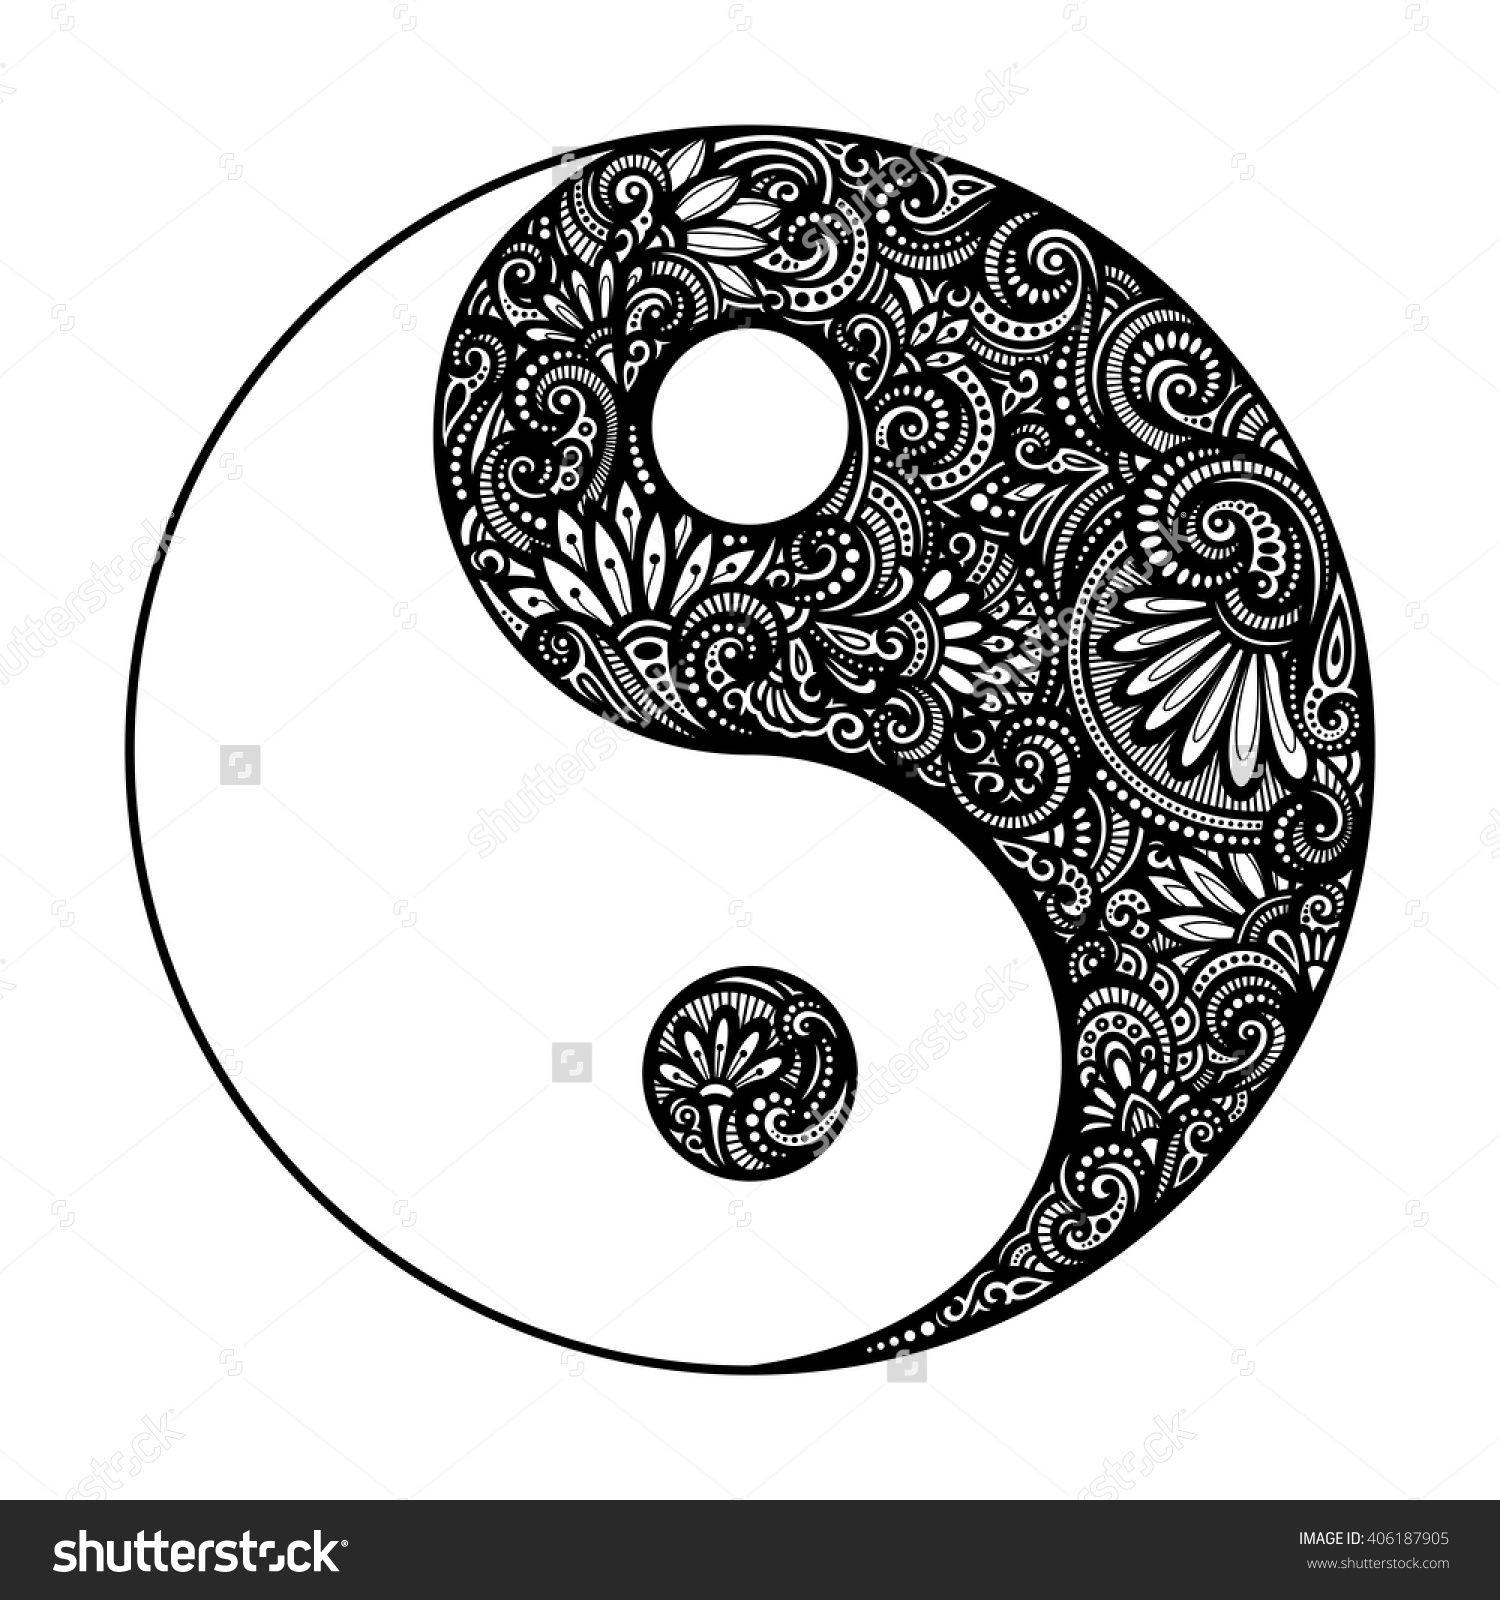 Image Result For Yin Yang Tatoo Desenho De Mandala Tatuagem Yin Yang